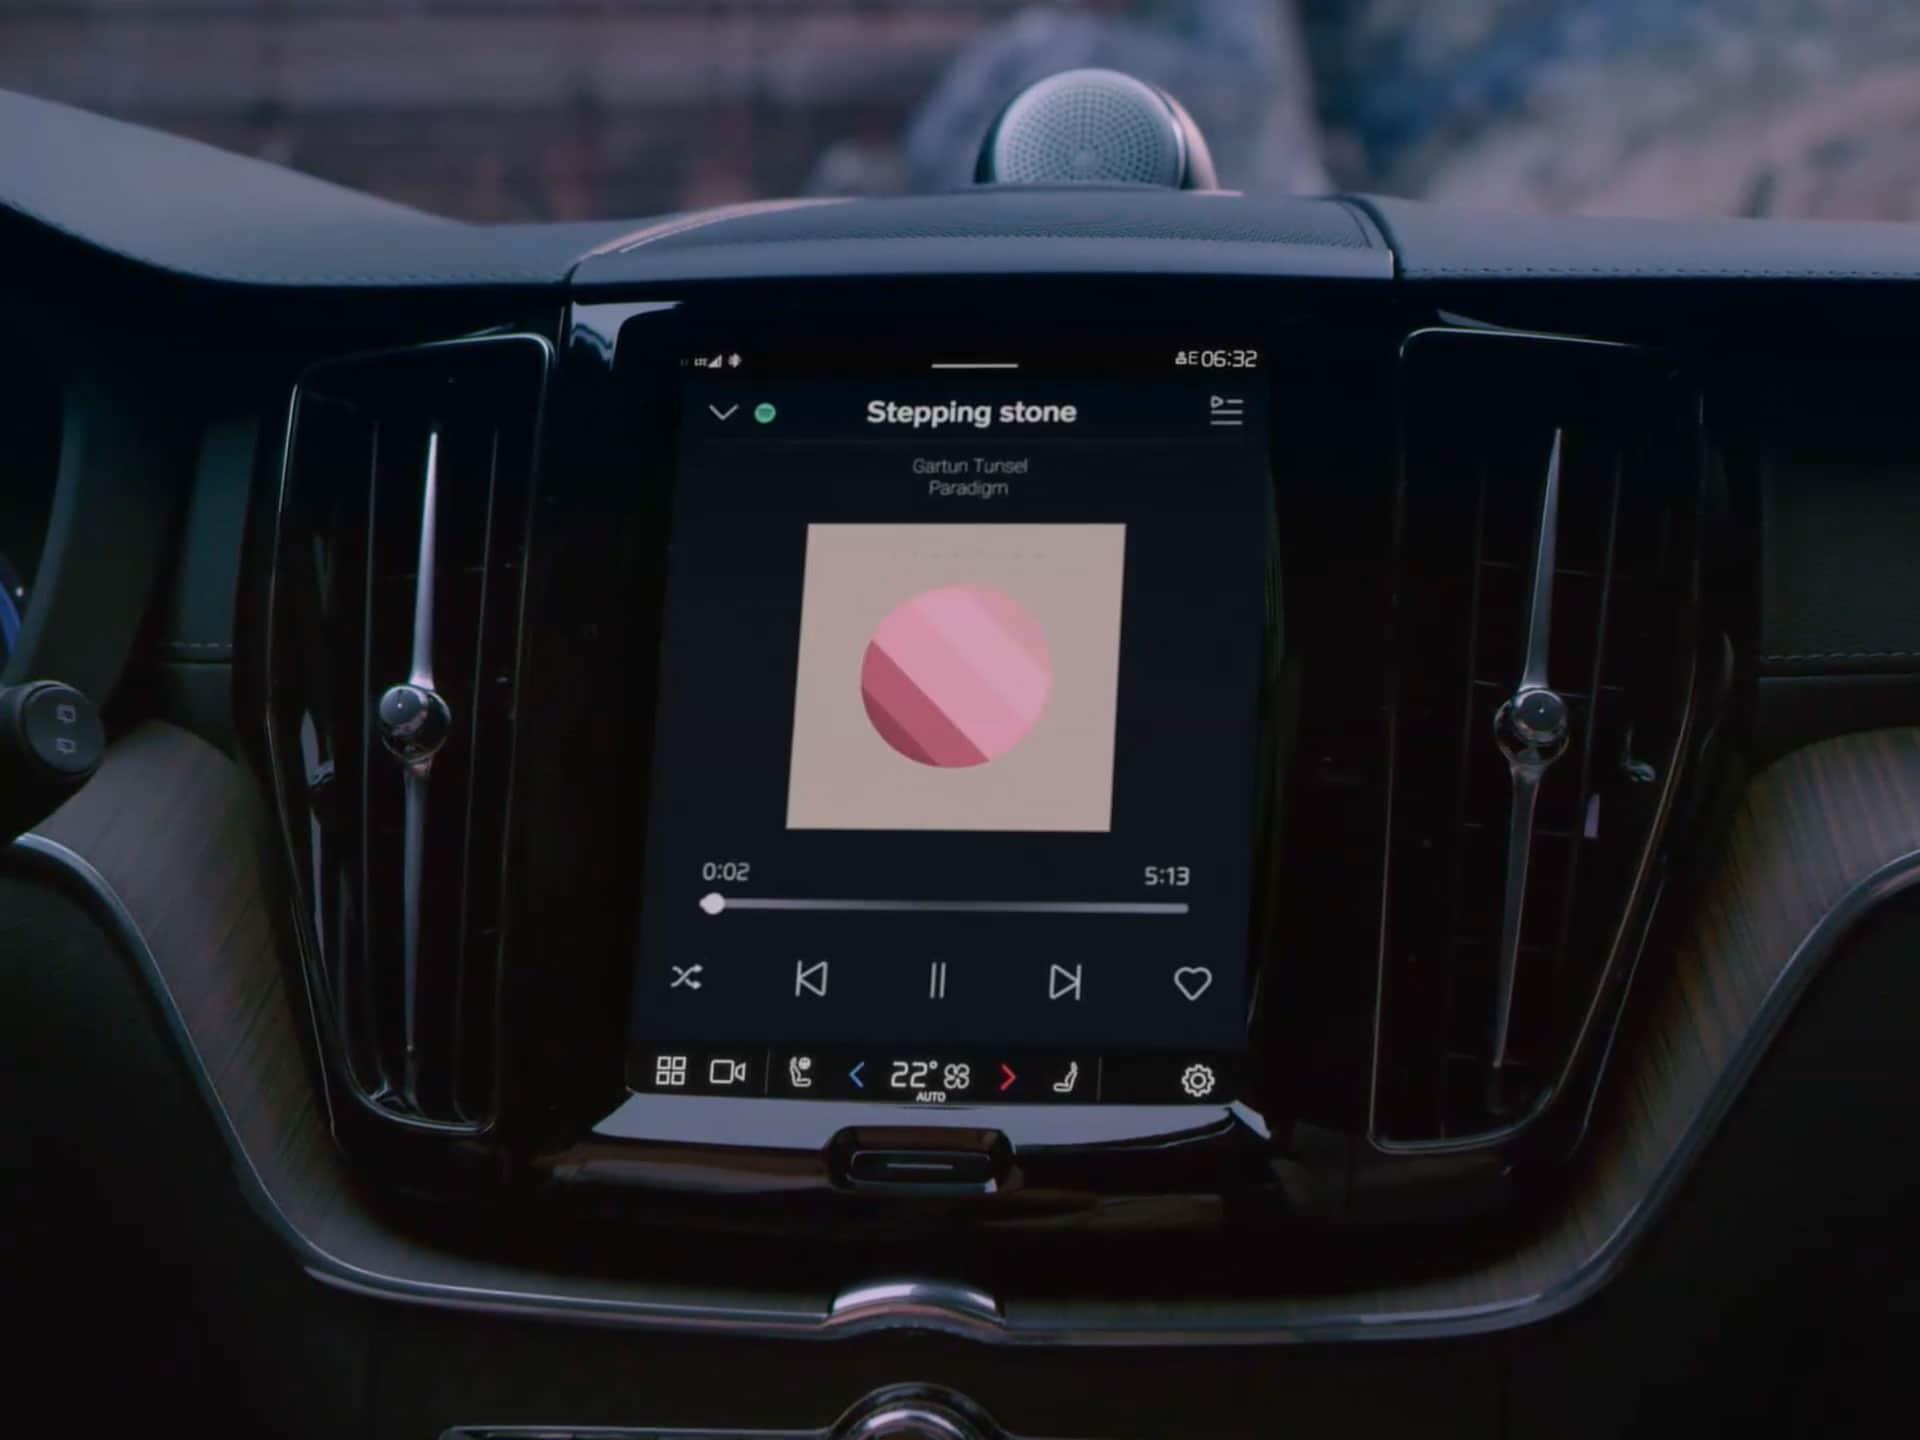 Érintésmentes hangvezérlés Google Assistant-tal a Volvo XC60 Recharge modellben.